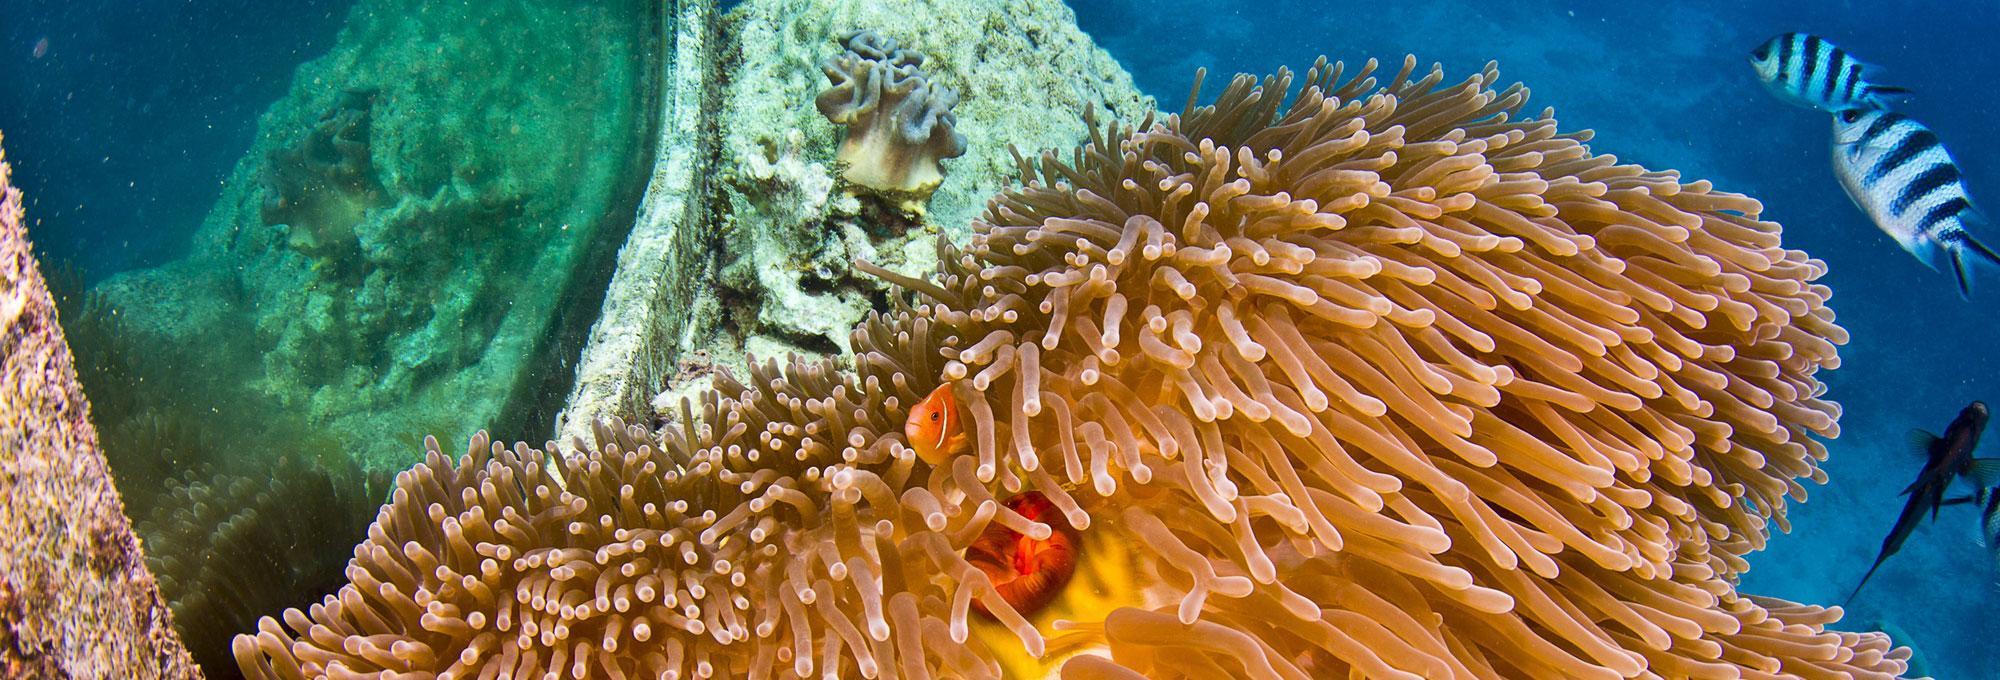 Underwater Observatory Image 2